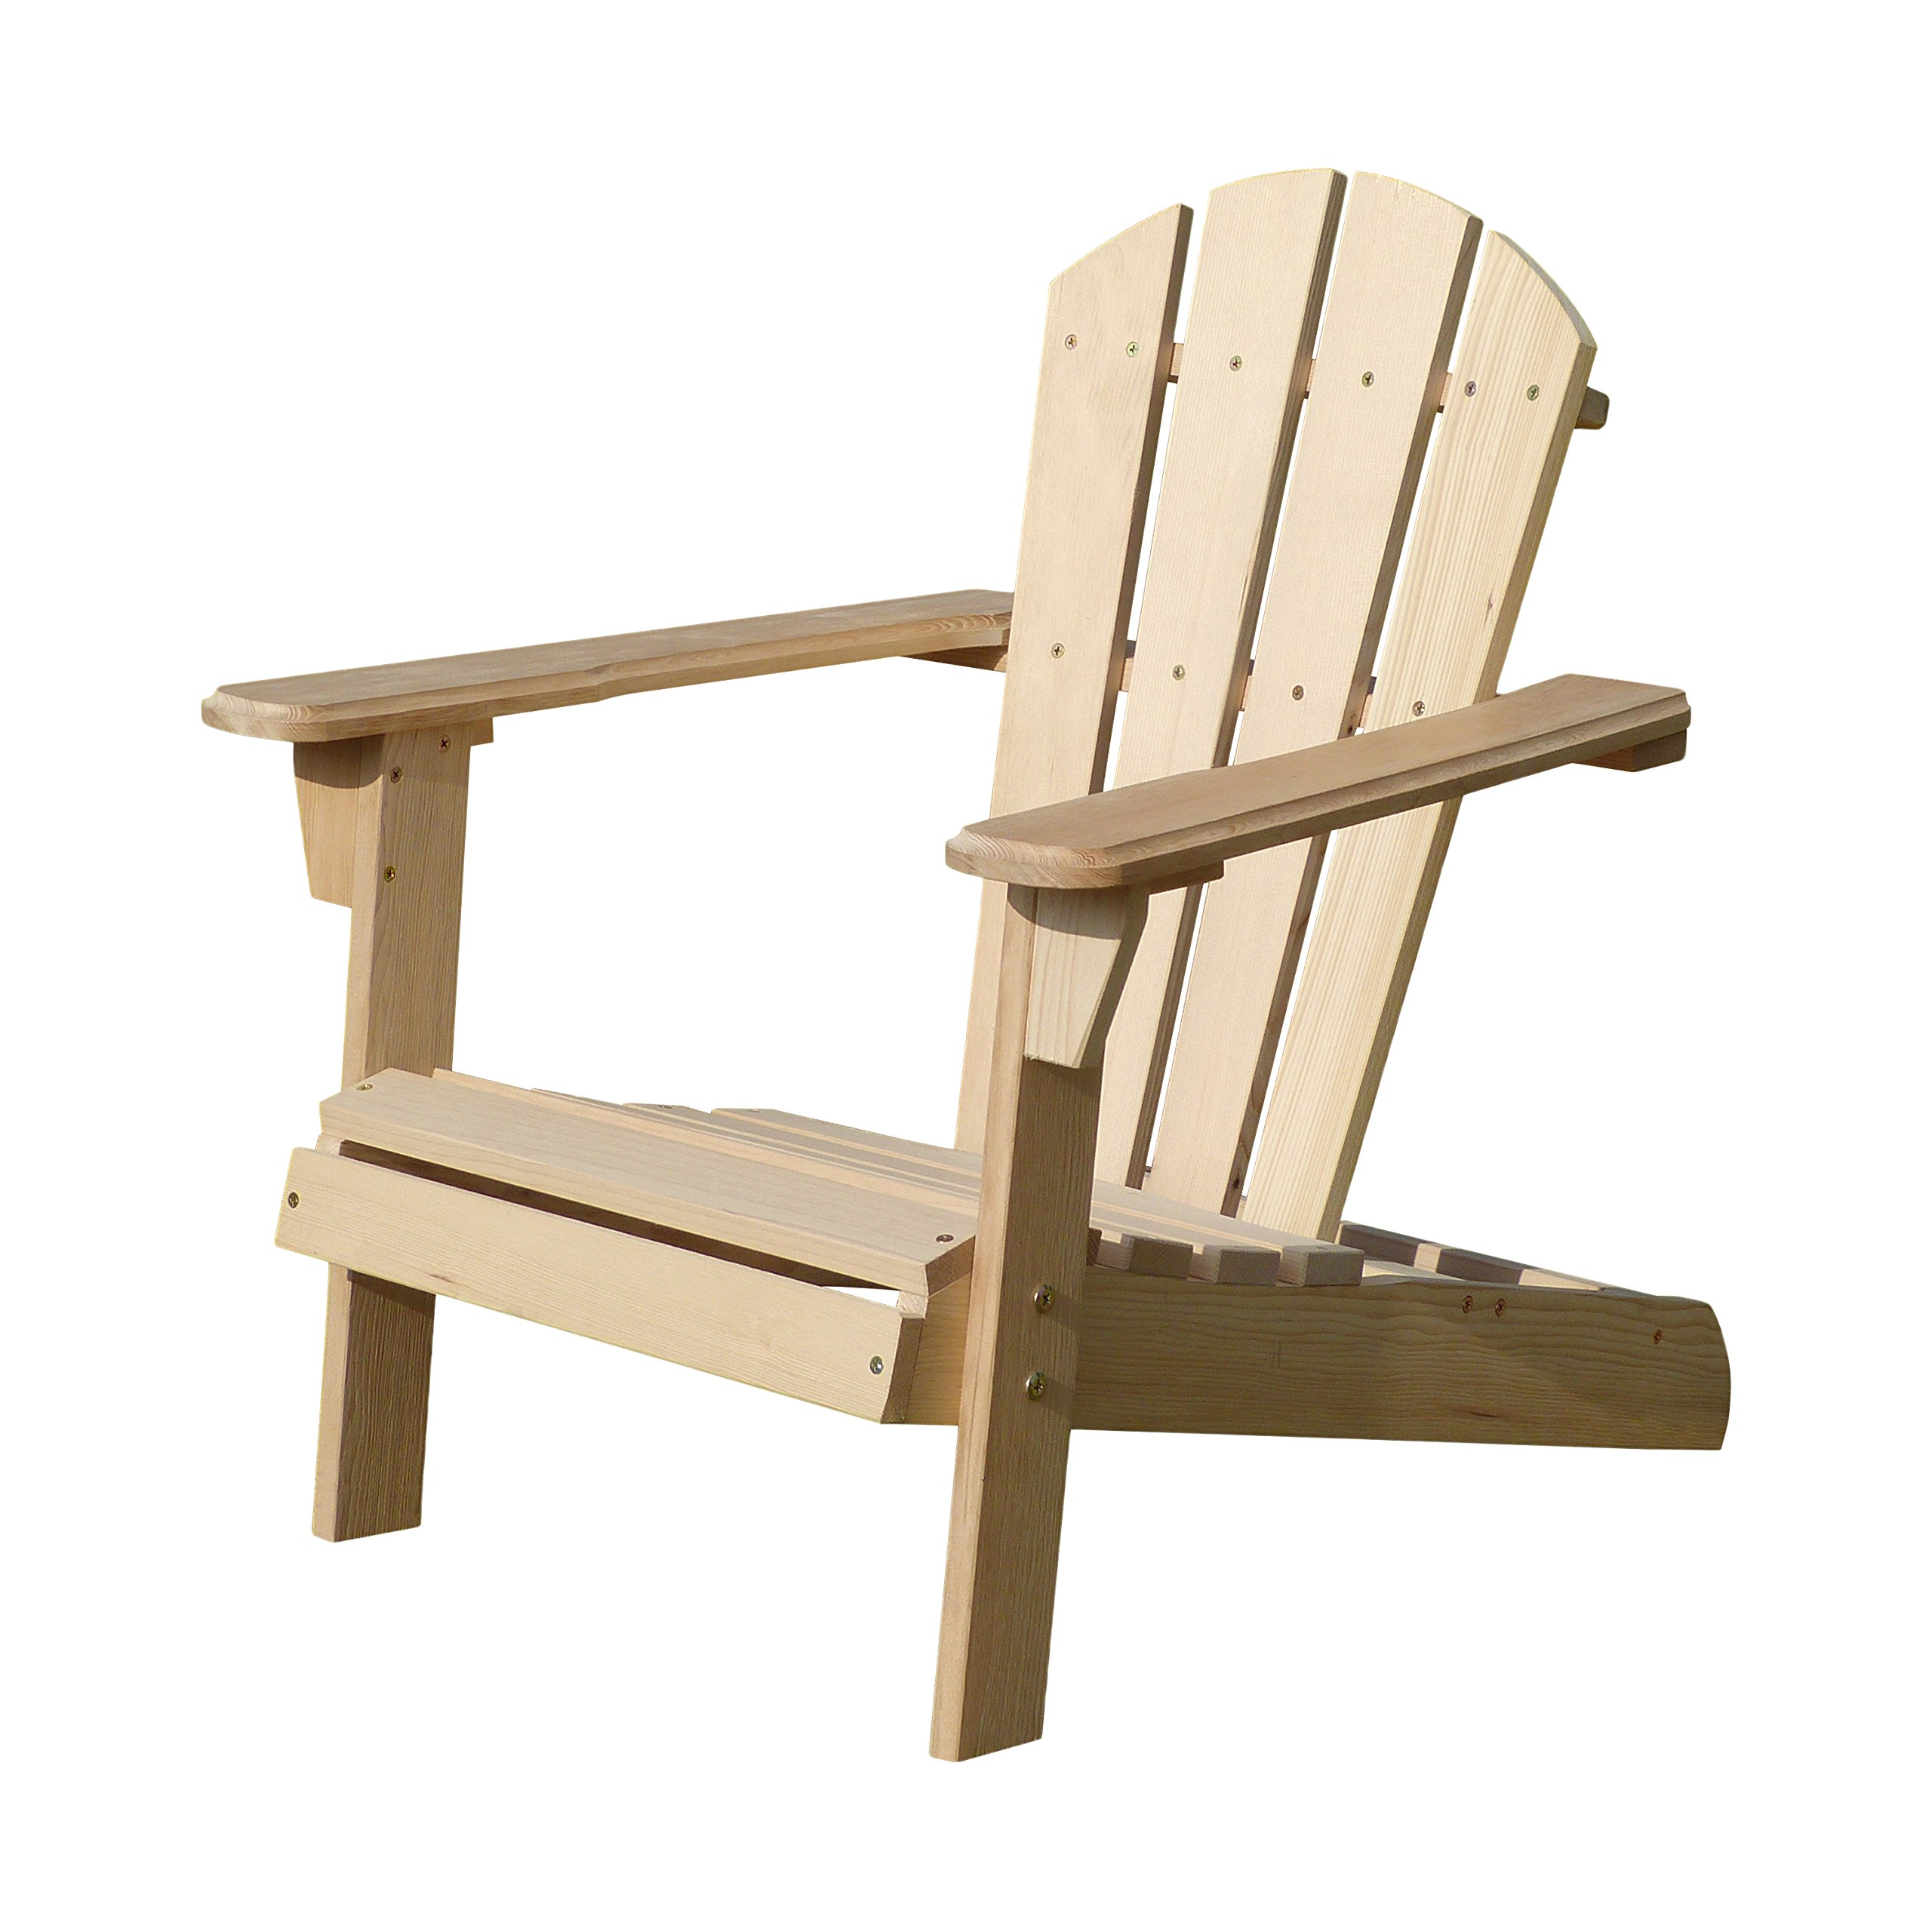 Merry Garden Kids Foldable Wooden Adirondack Chair, Children's Outdoor Patio Furniture, Garden, Lawn, Deck Chair, Unfinished